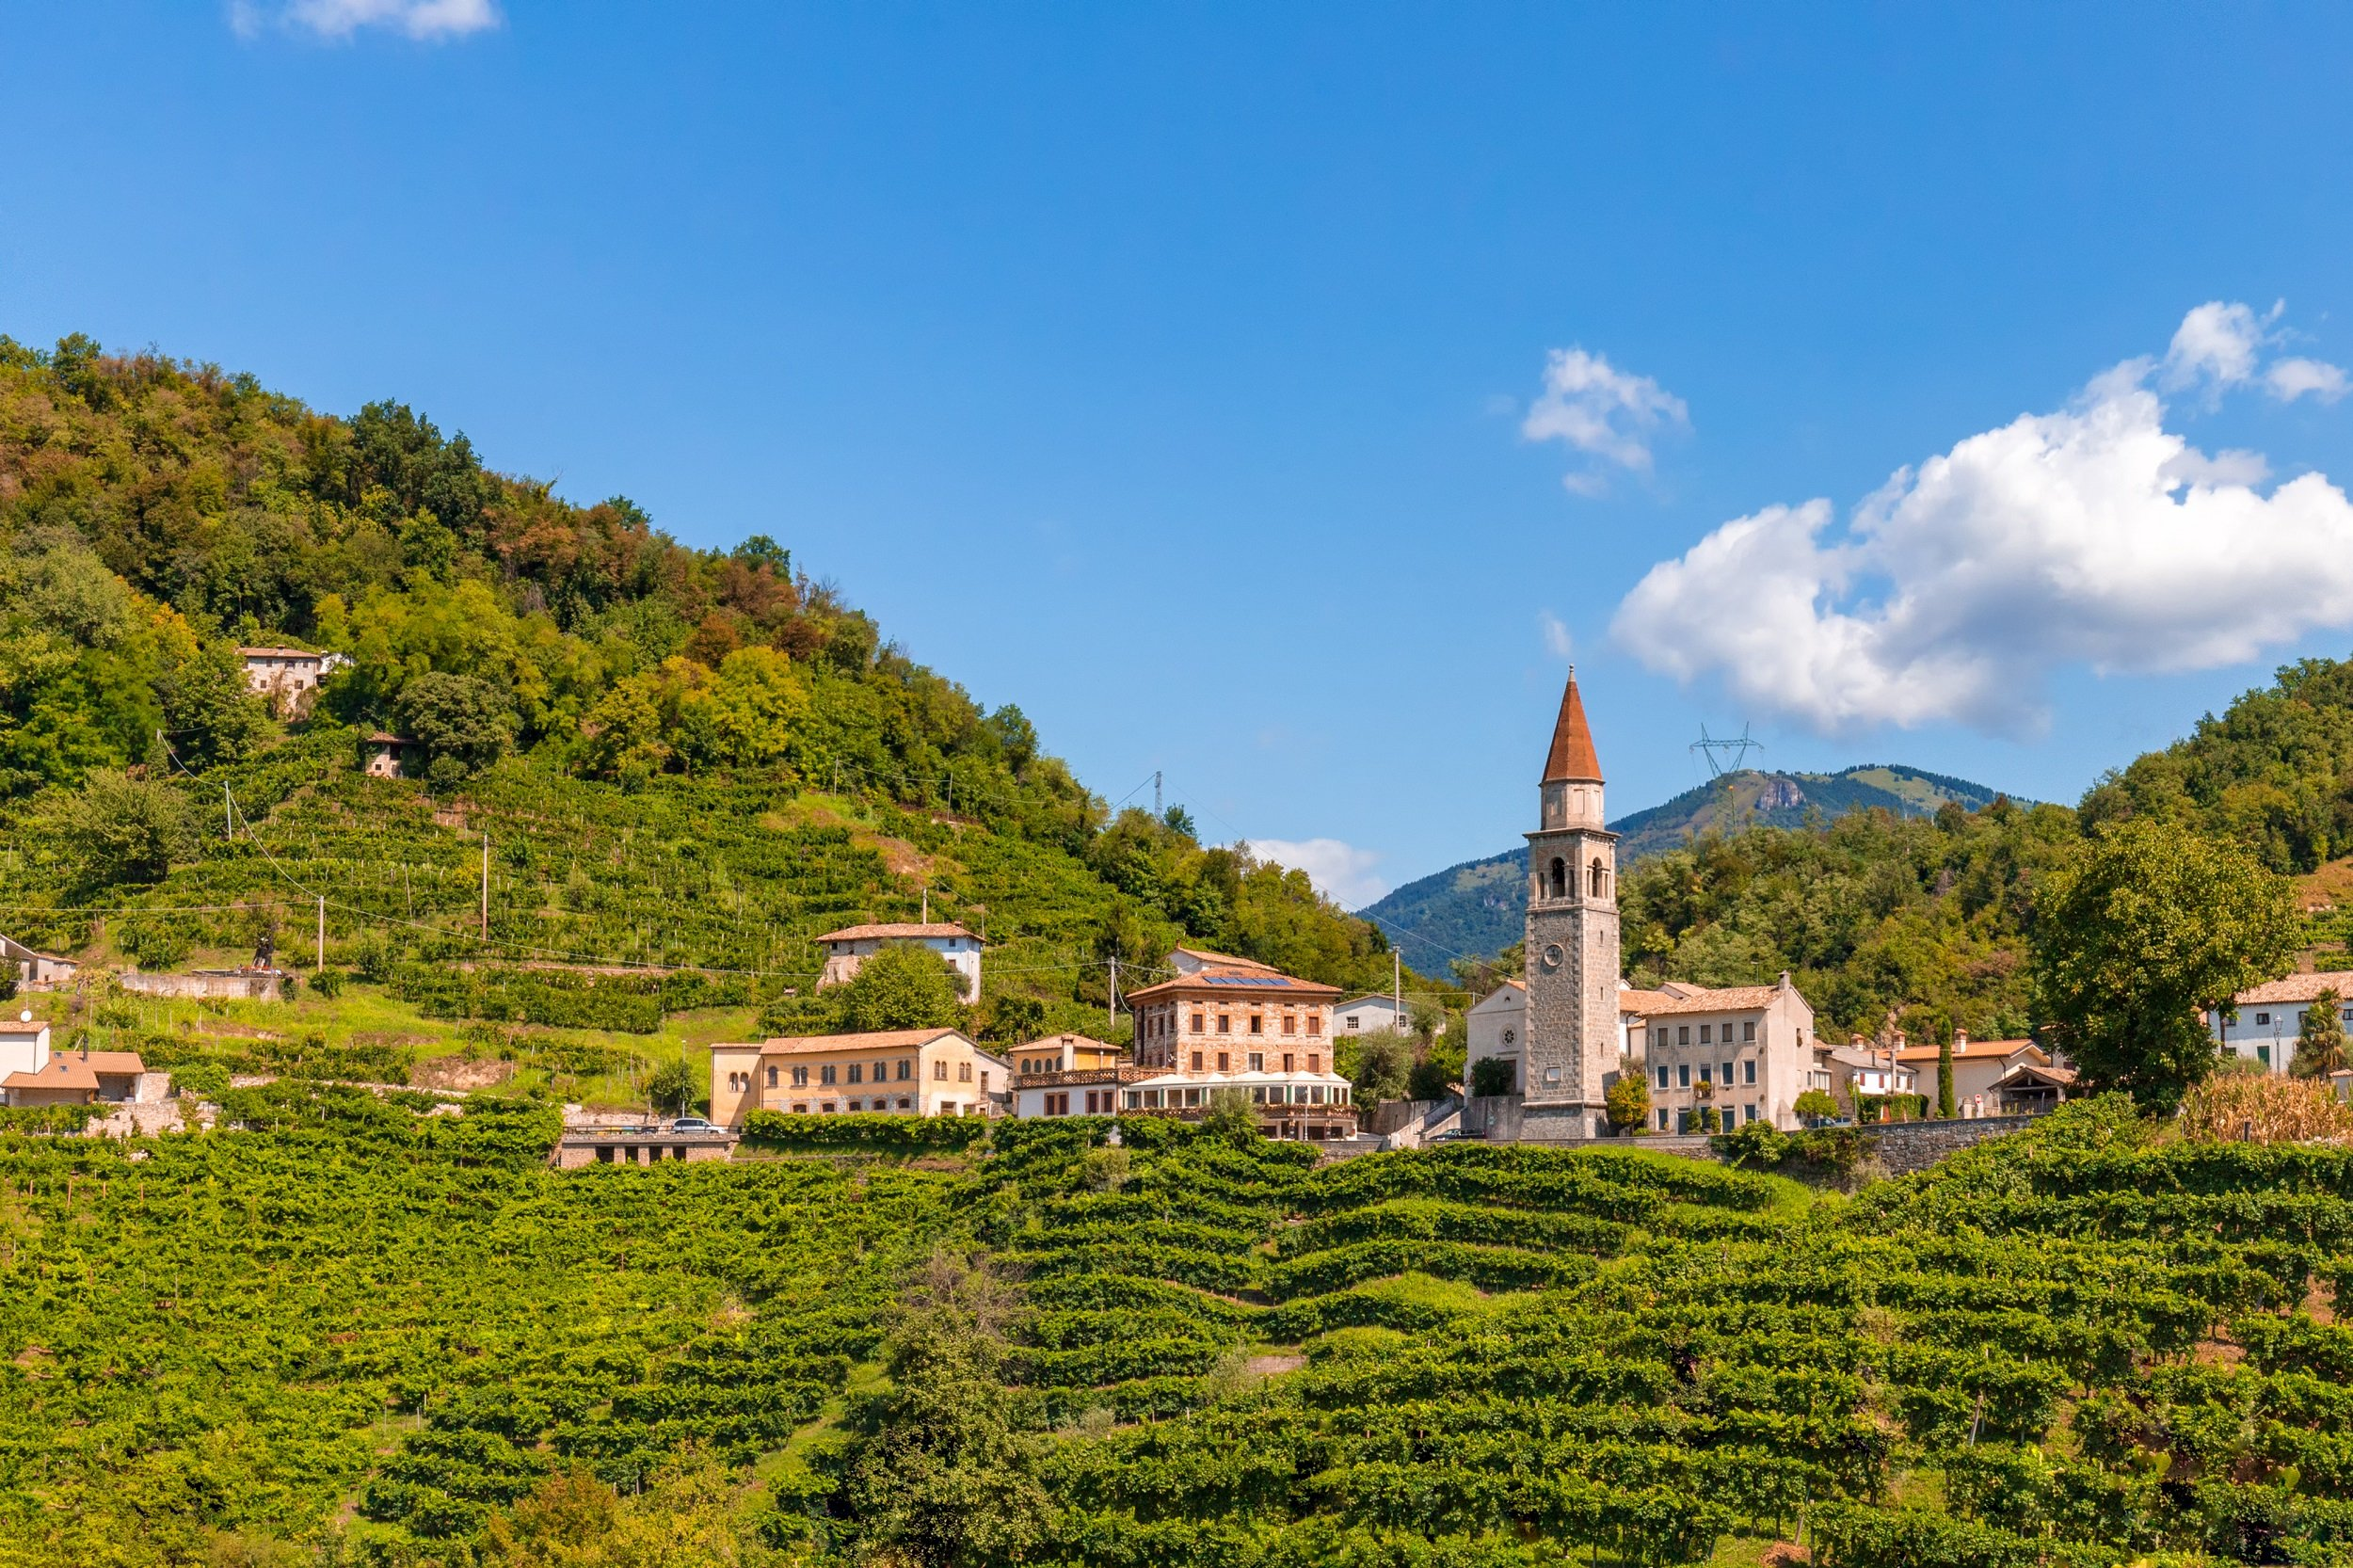 Lake Garda - Venice, Verona, Lake Garda & Countryside 5 Day Tour Package_6